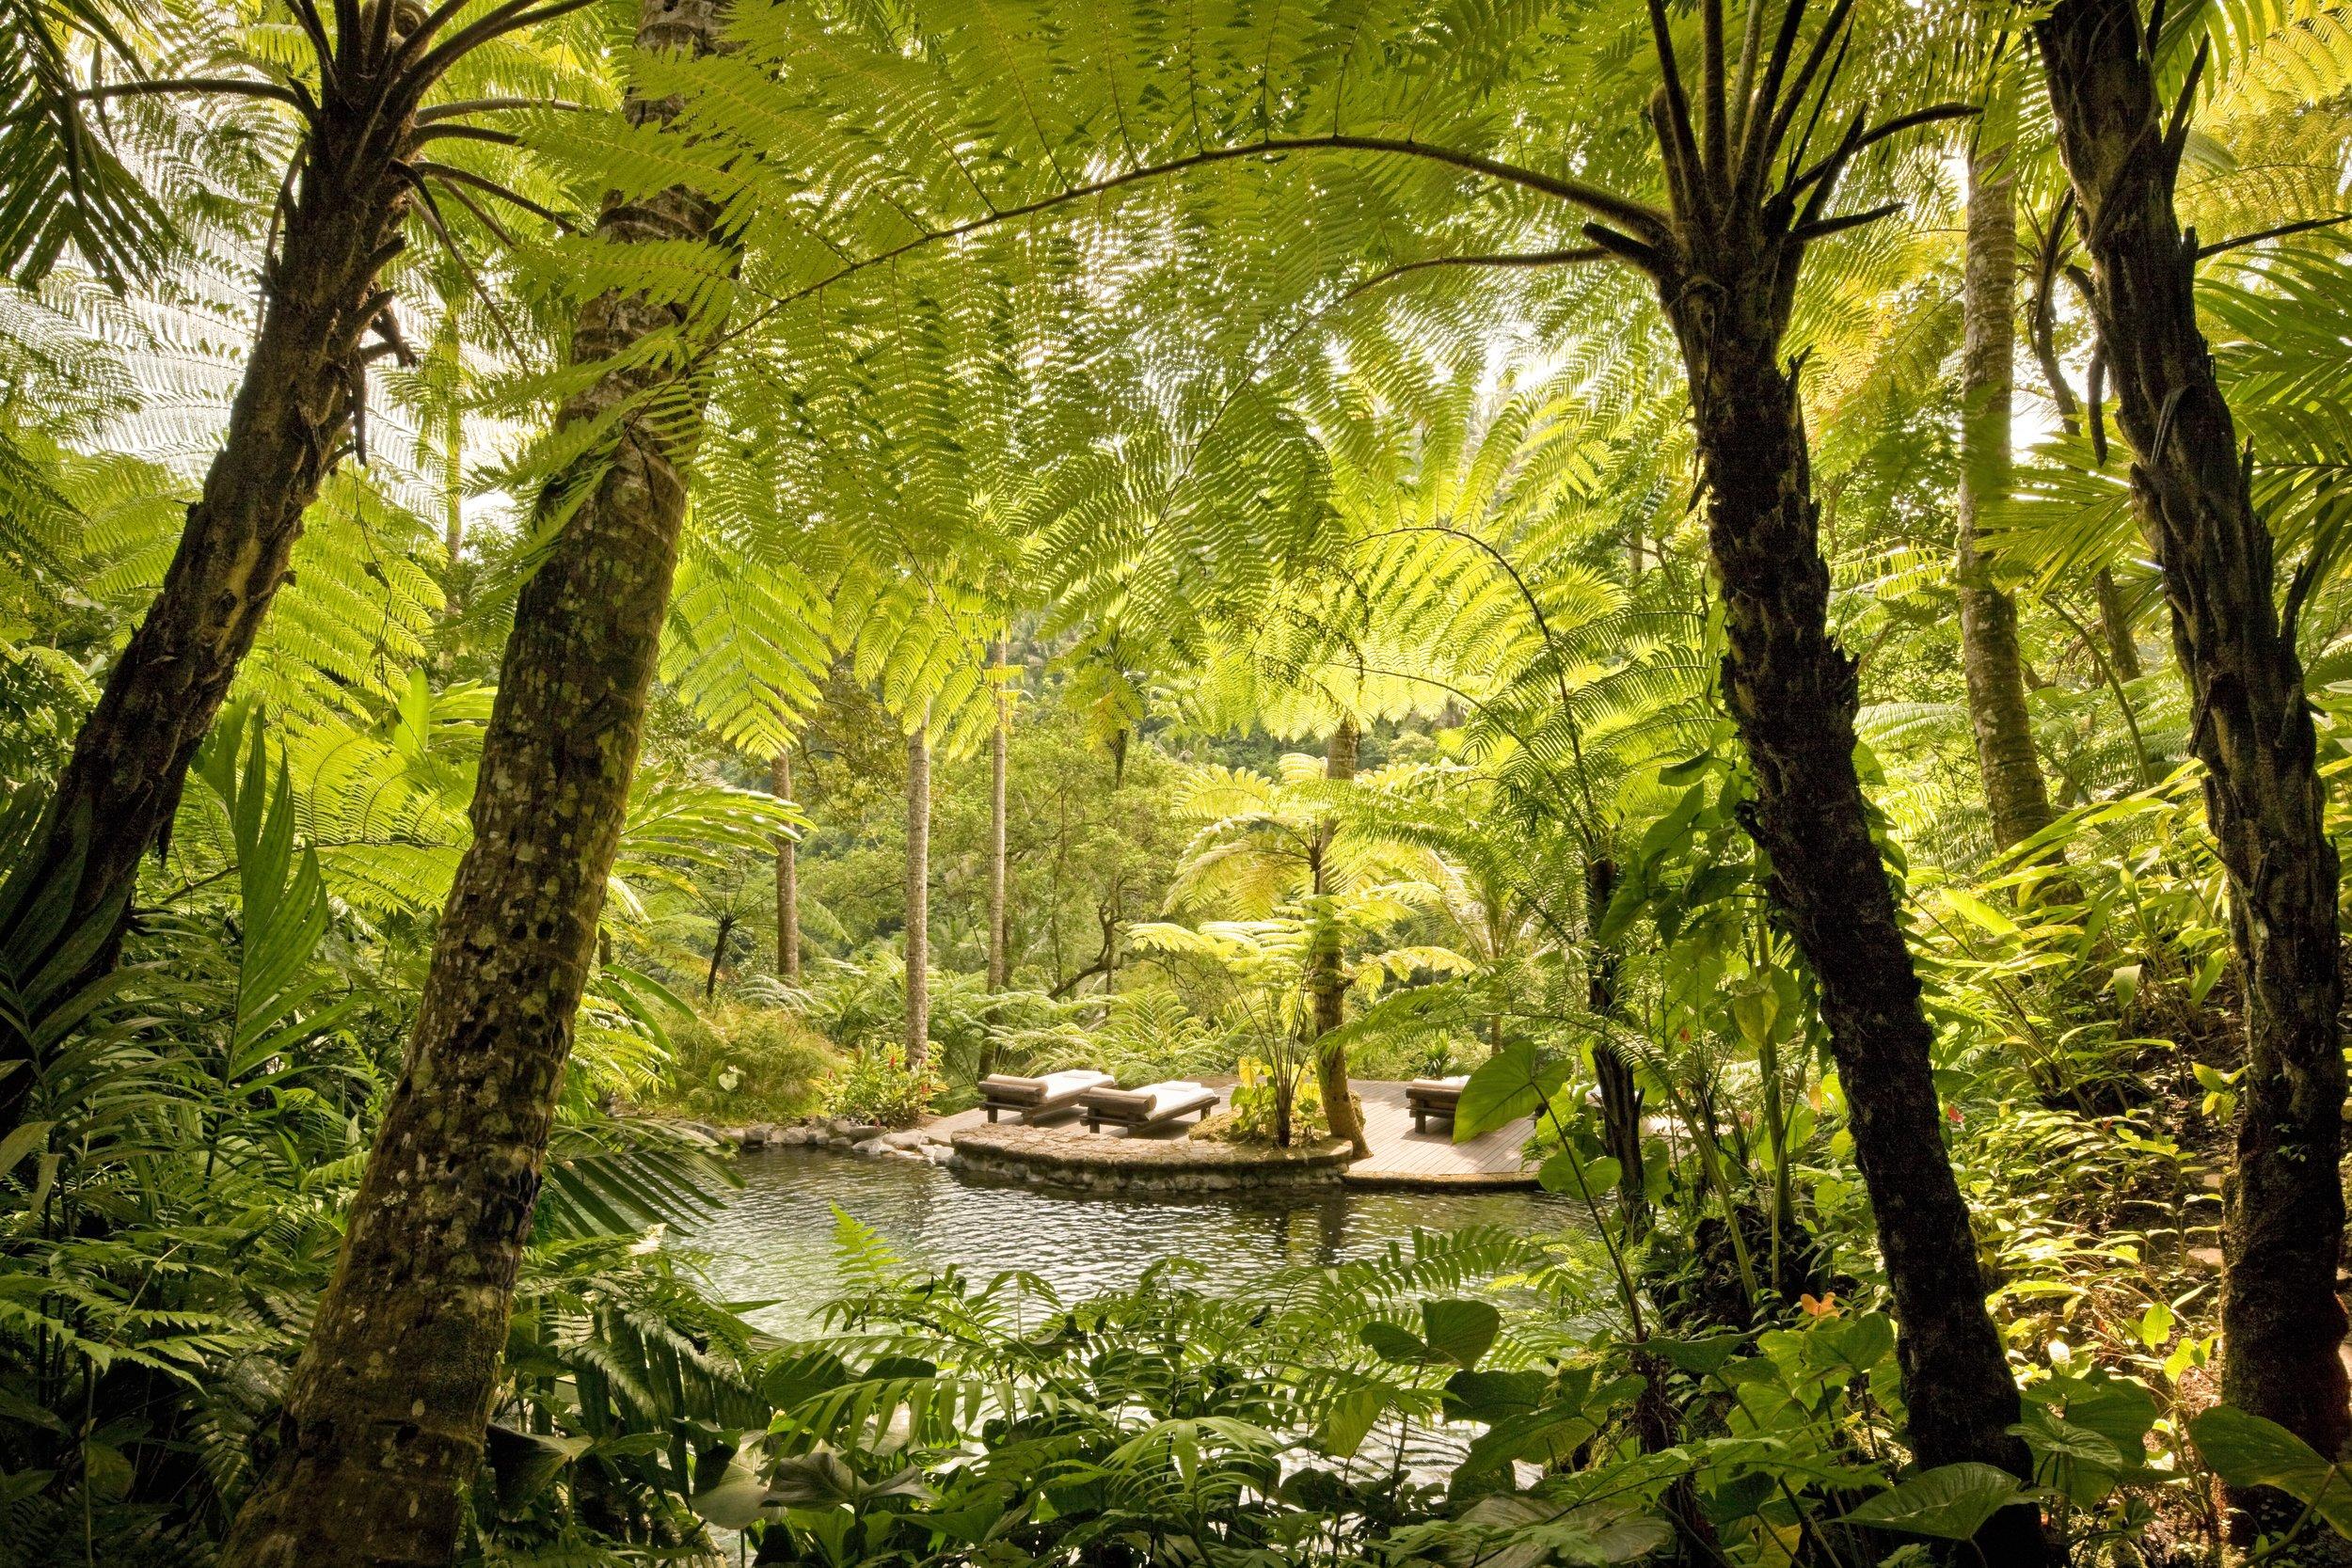 44164764-H1-Kedara_(Water_Garden)_2.jpg